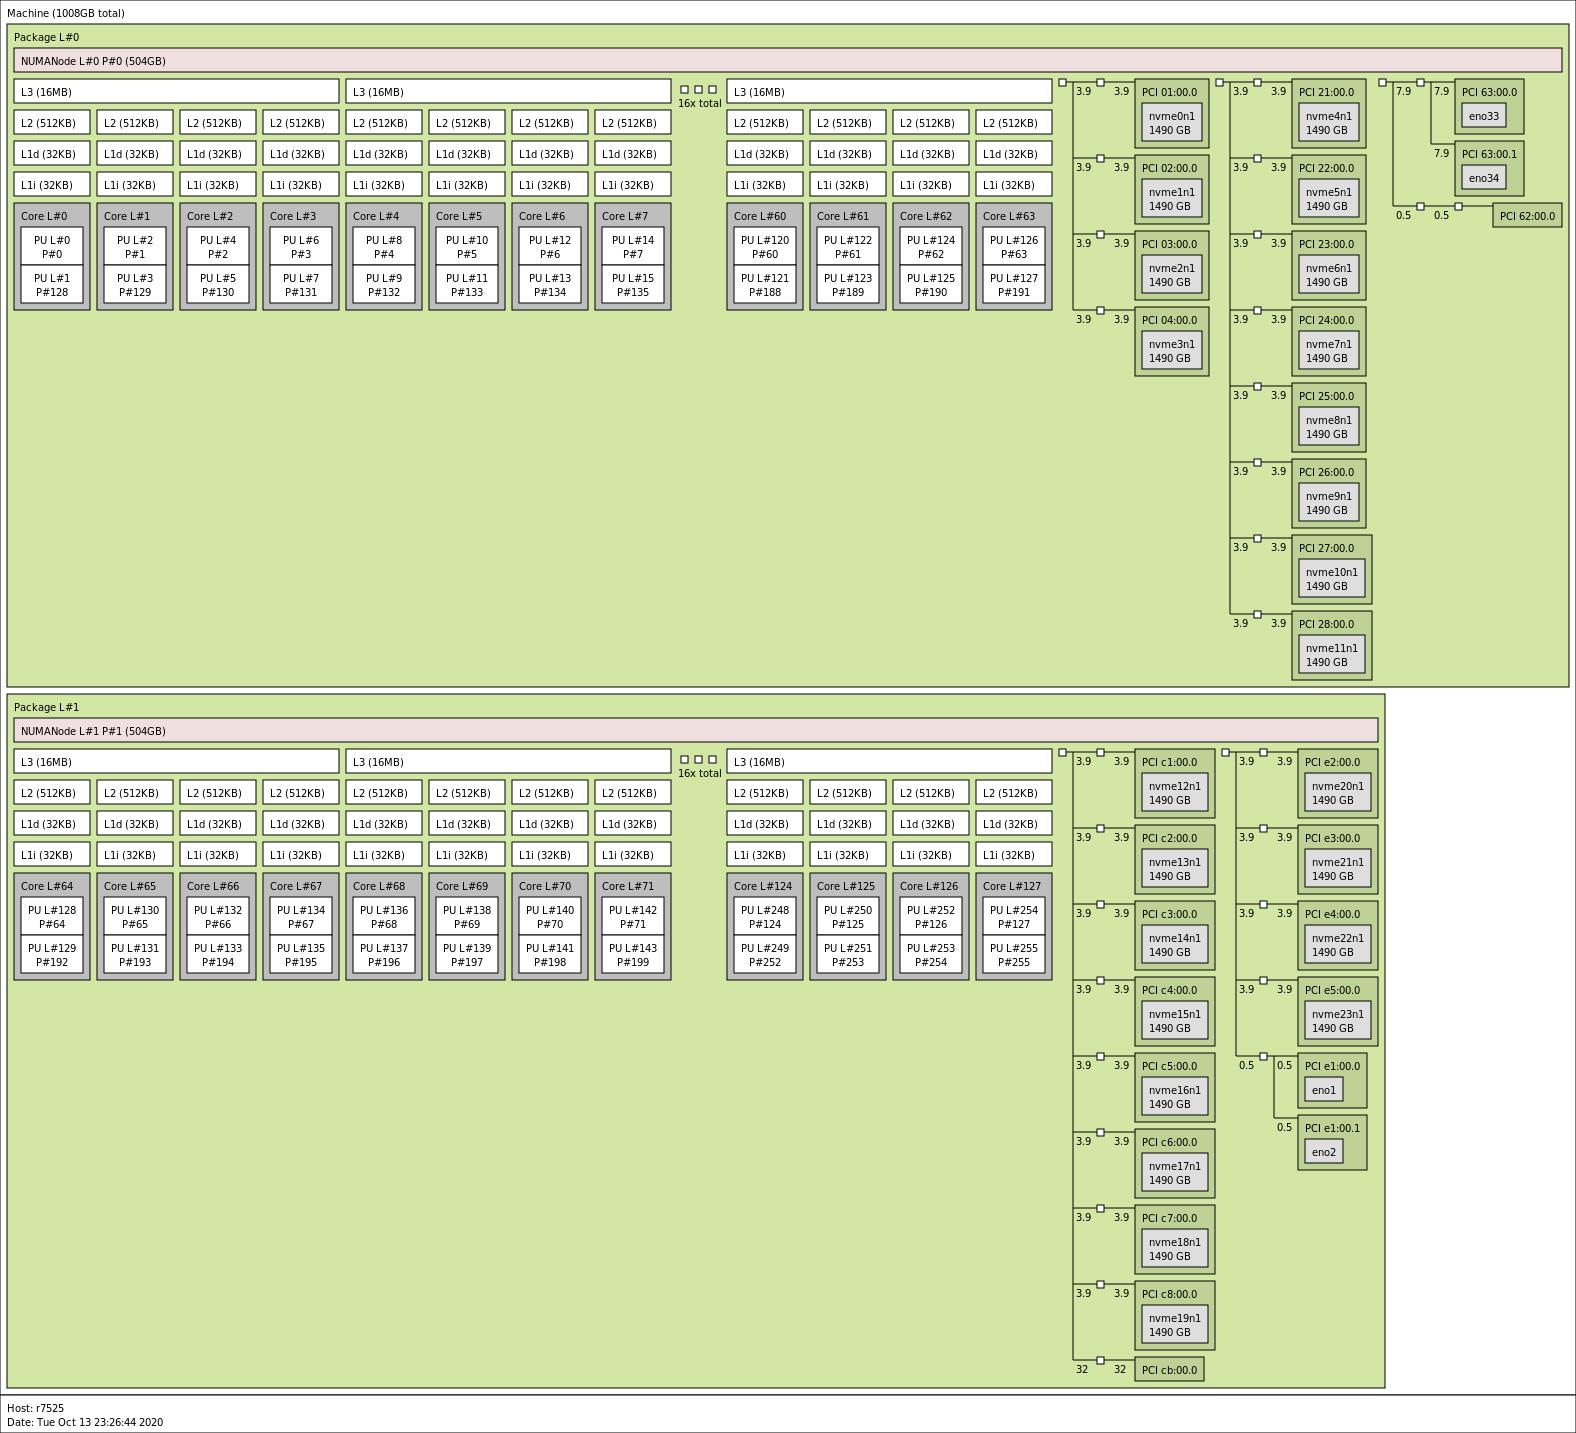 Dell EMC PowerEdge R7525 Topology